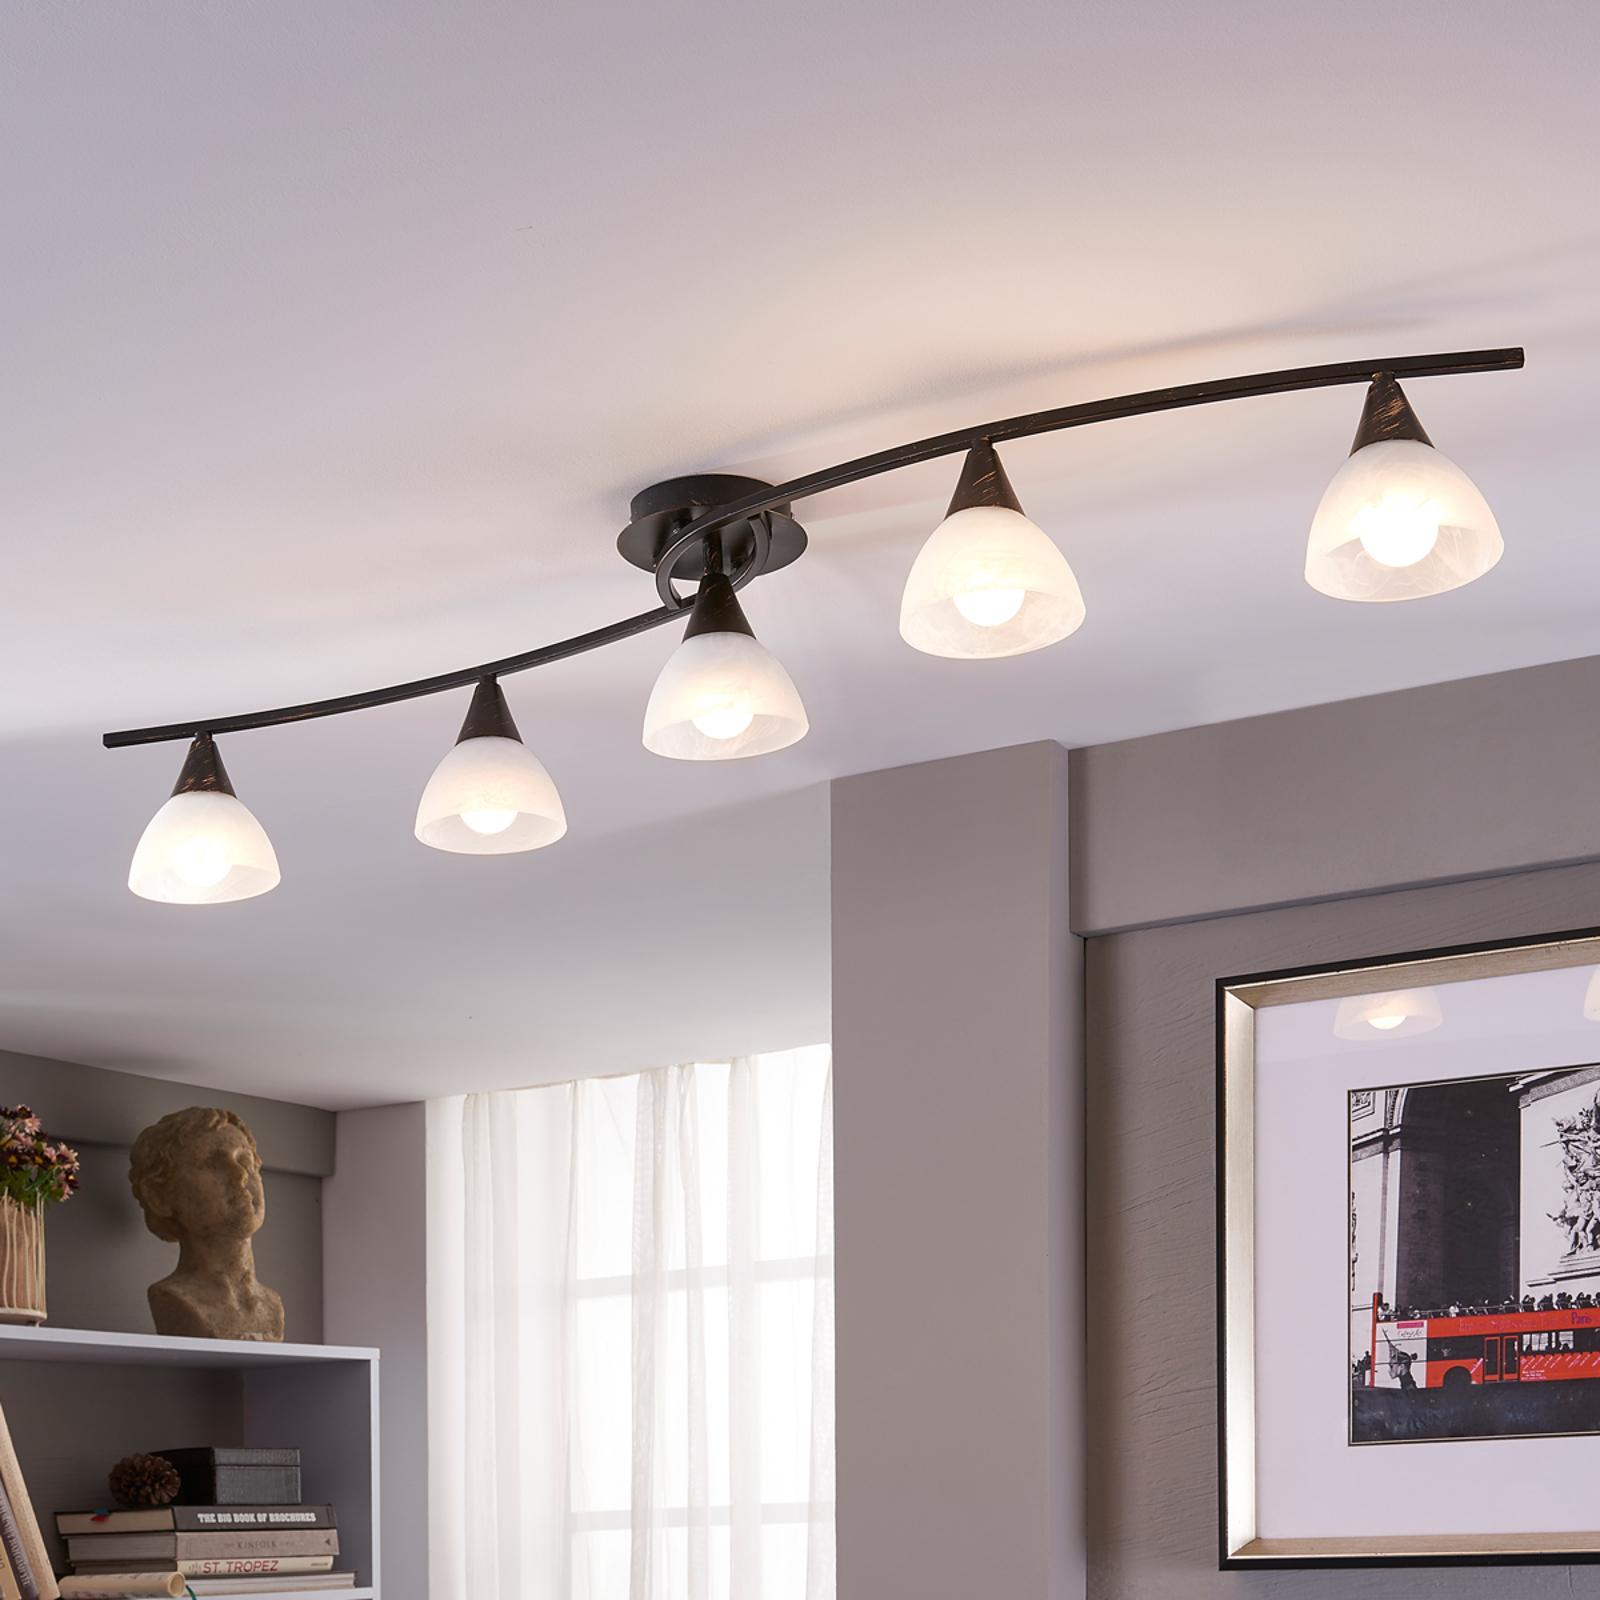 Pięciopunktowa lampa sufitowa LED Della, podłużna